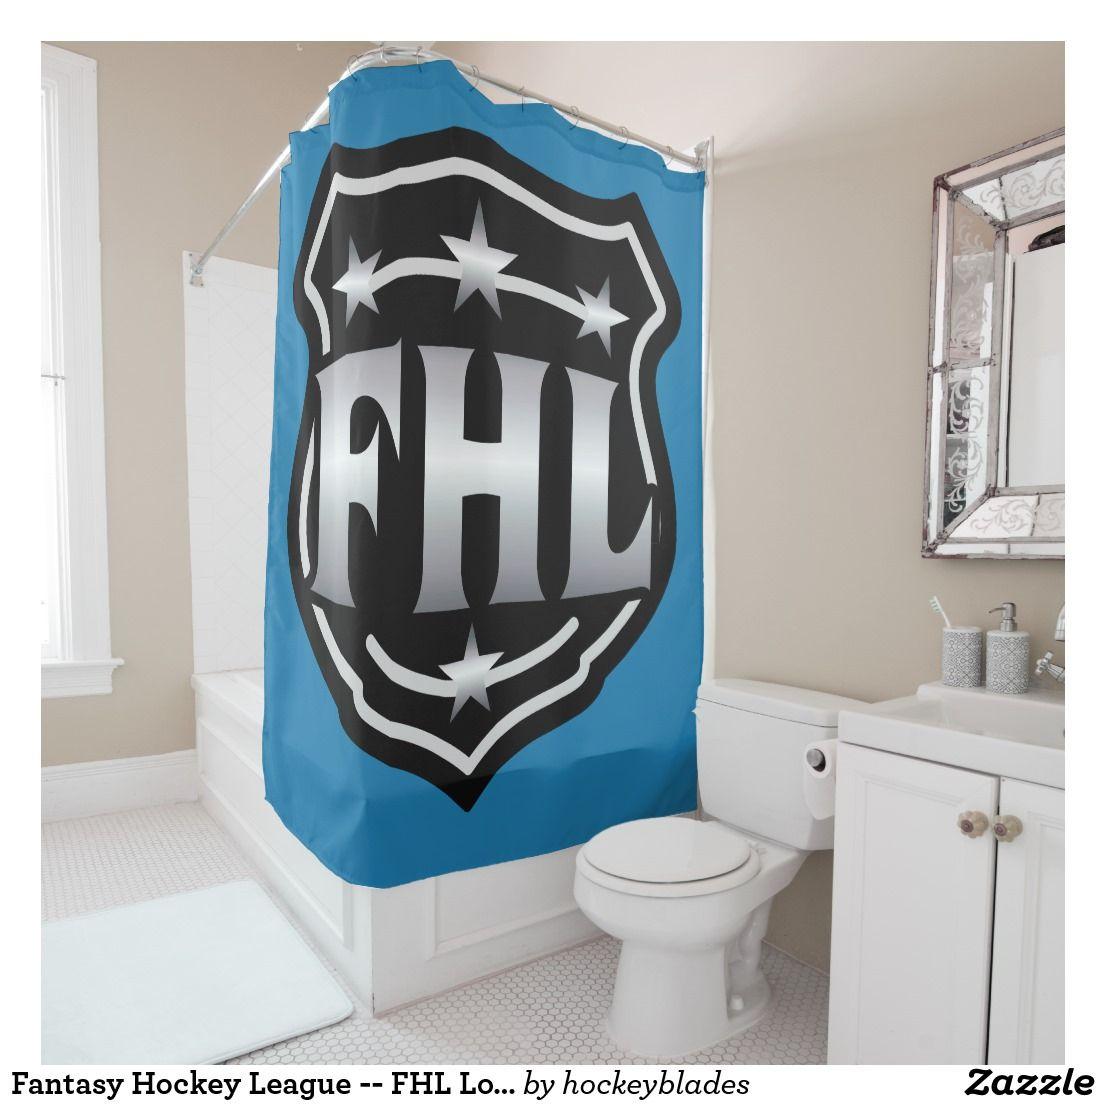 Fantasy Hockey League Fhl Logo Shower Curtain Zazzle Com